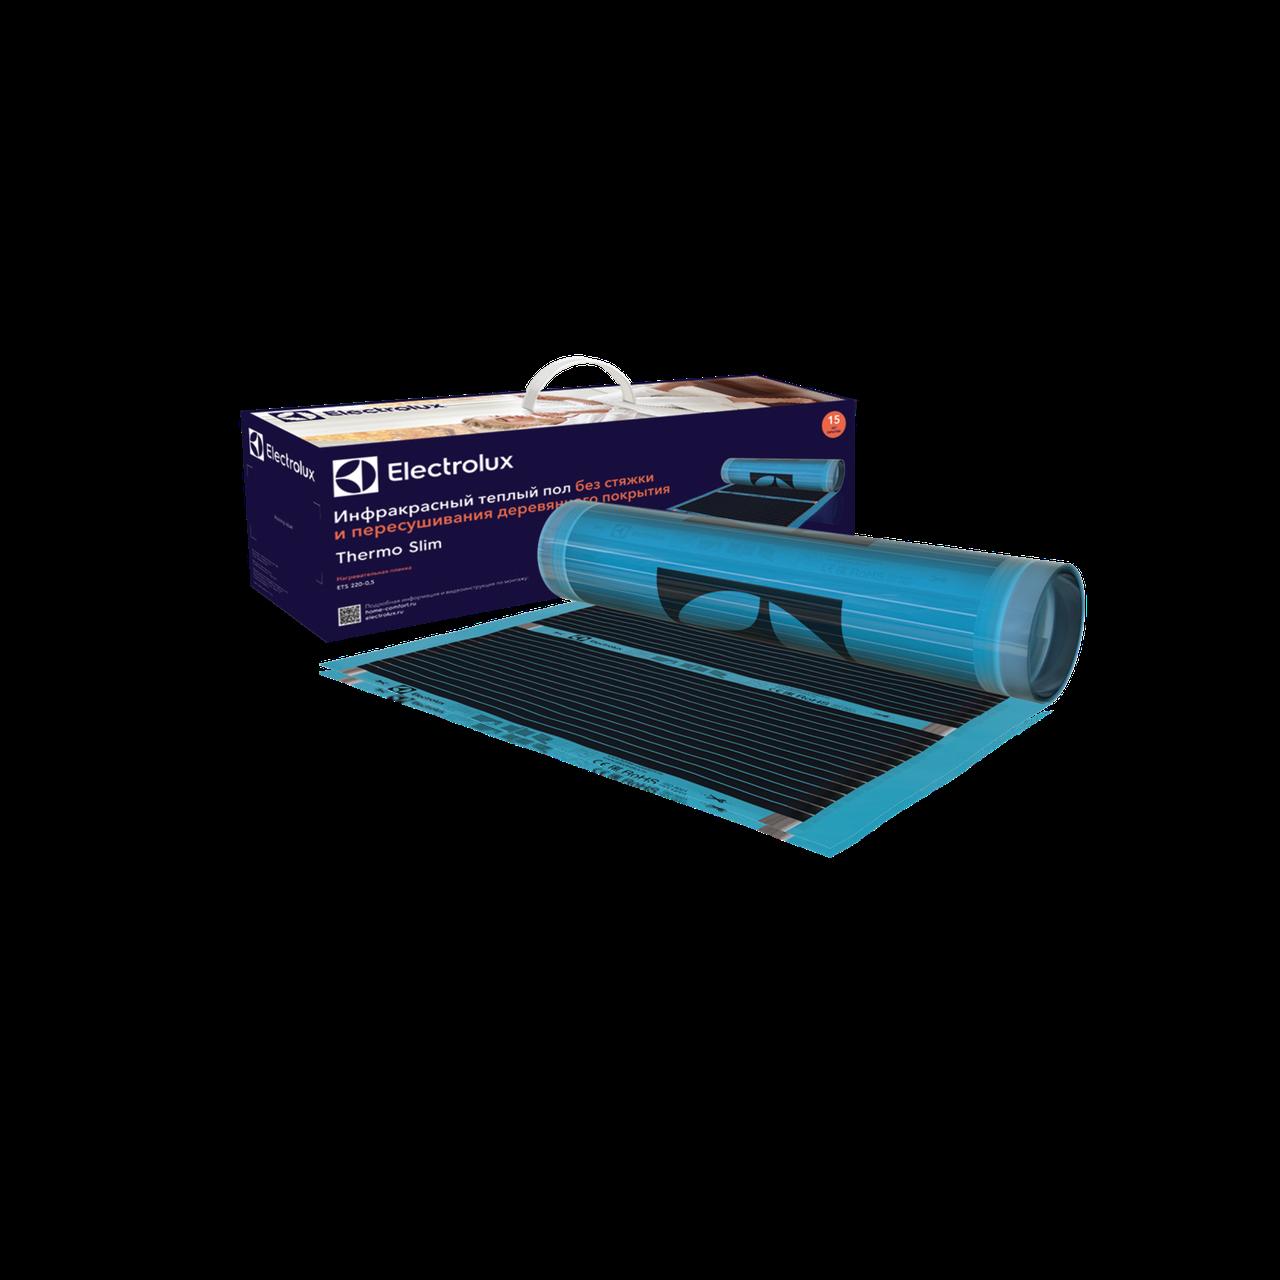 Electrolux Thermo Slim (ширина 0,5 метра)